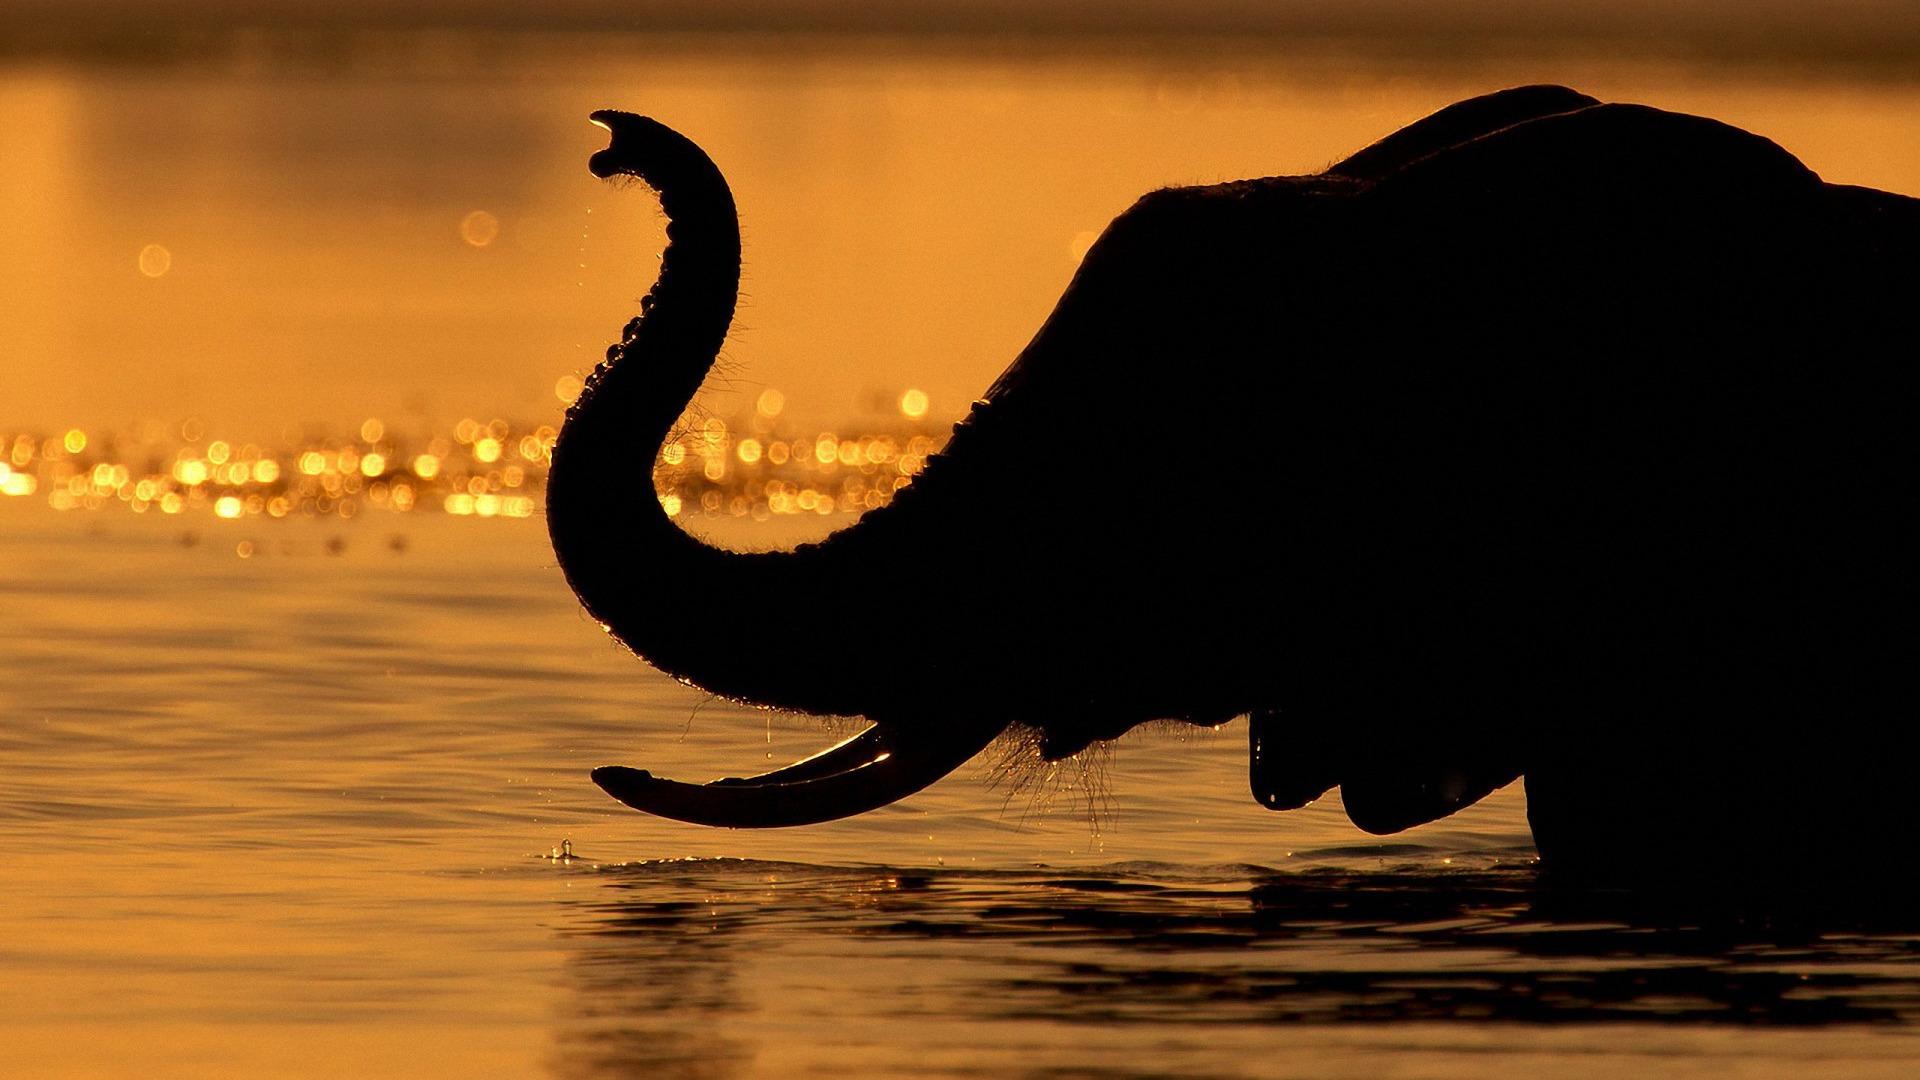 Elephant Siluet Wallpaper Elephant Hd Wallpapers 1080p